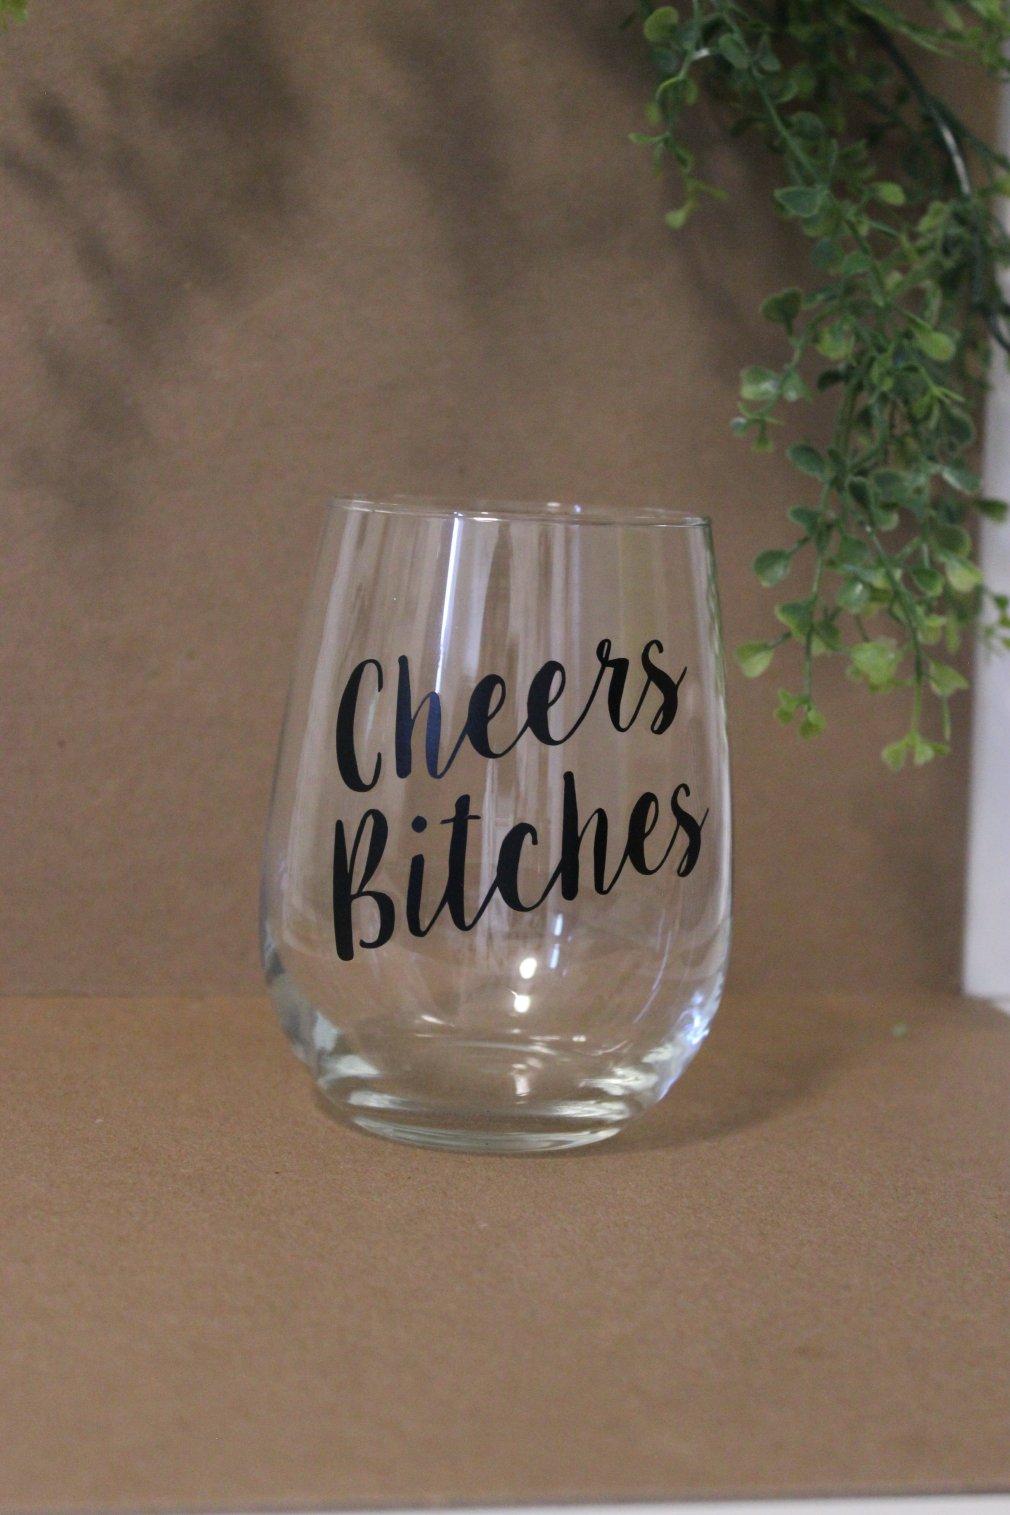 Wine Glasses - Cheers B*tches 00136